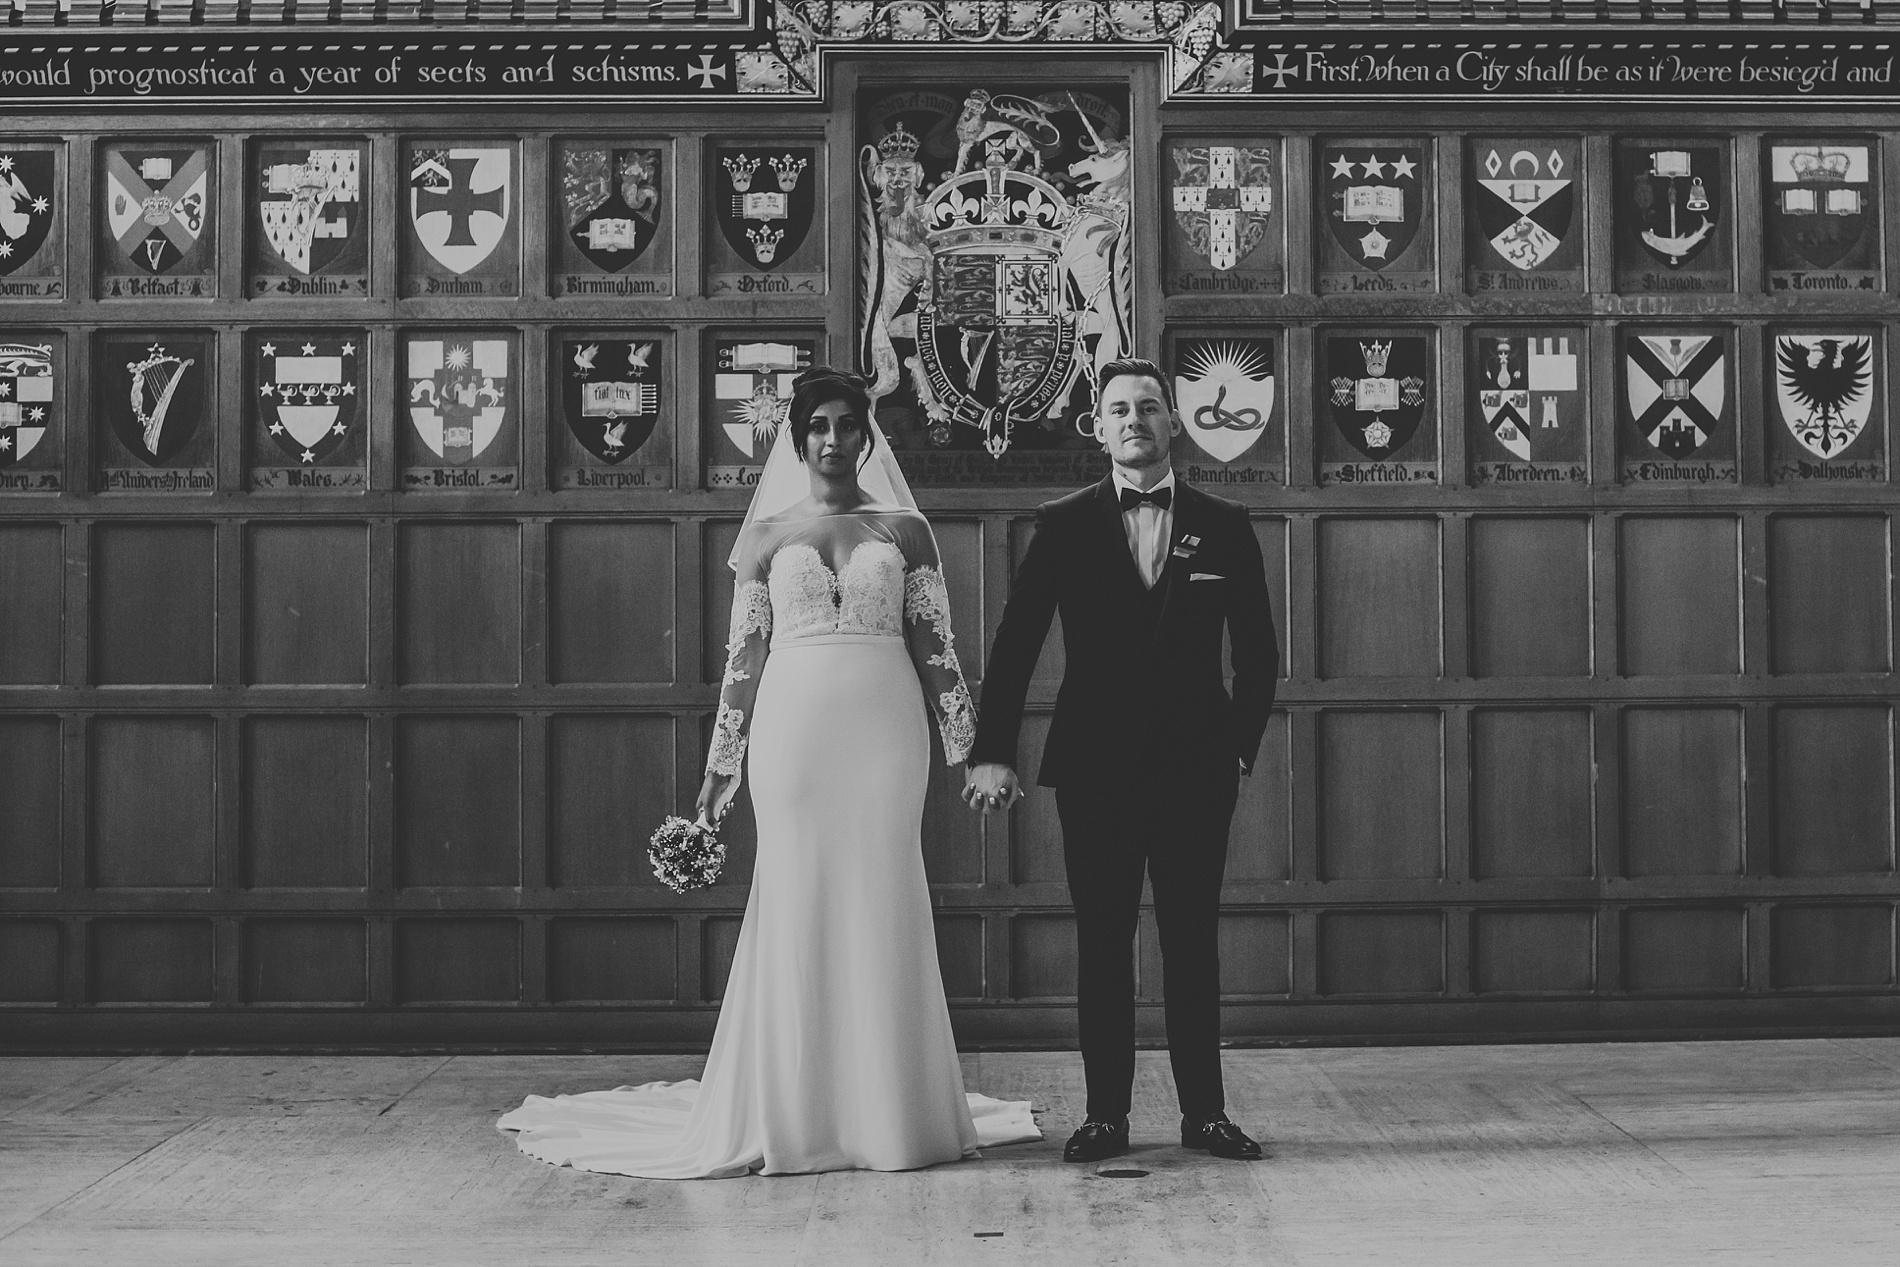 Eglington_Grand_Wedding_Photographer_0056.jpg